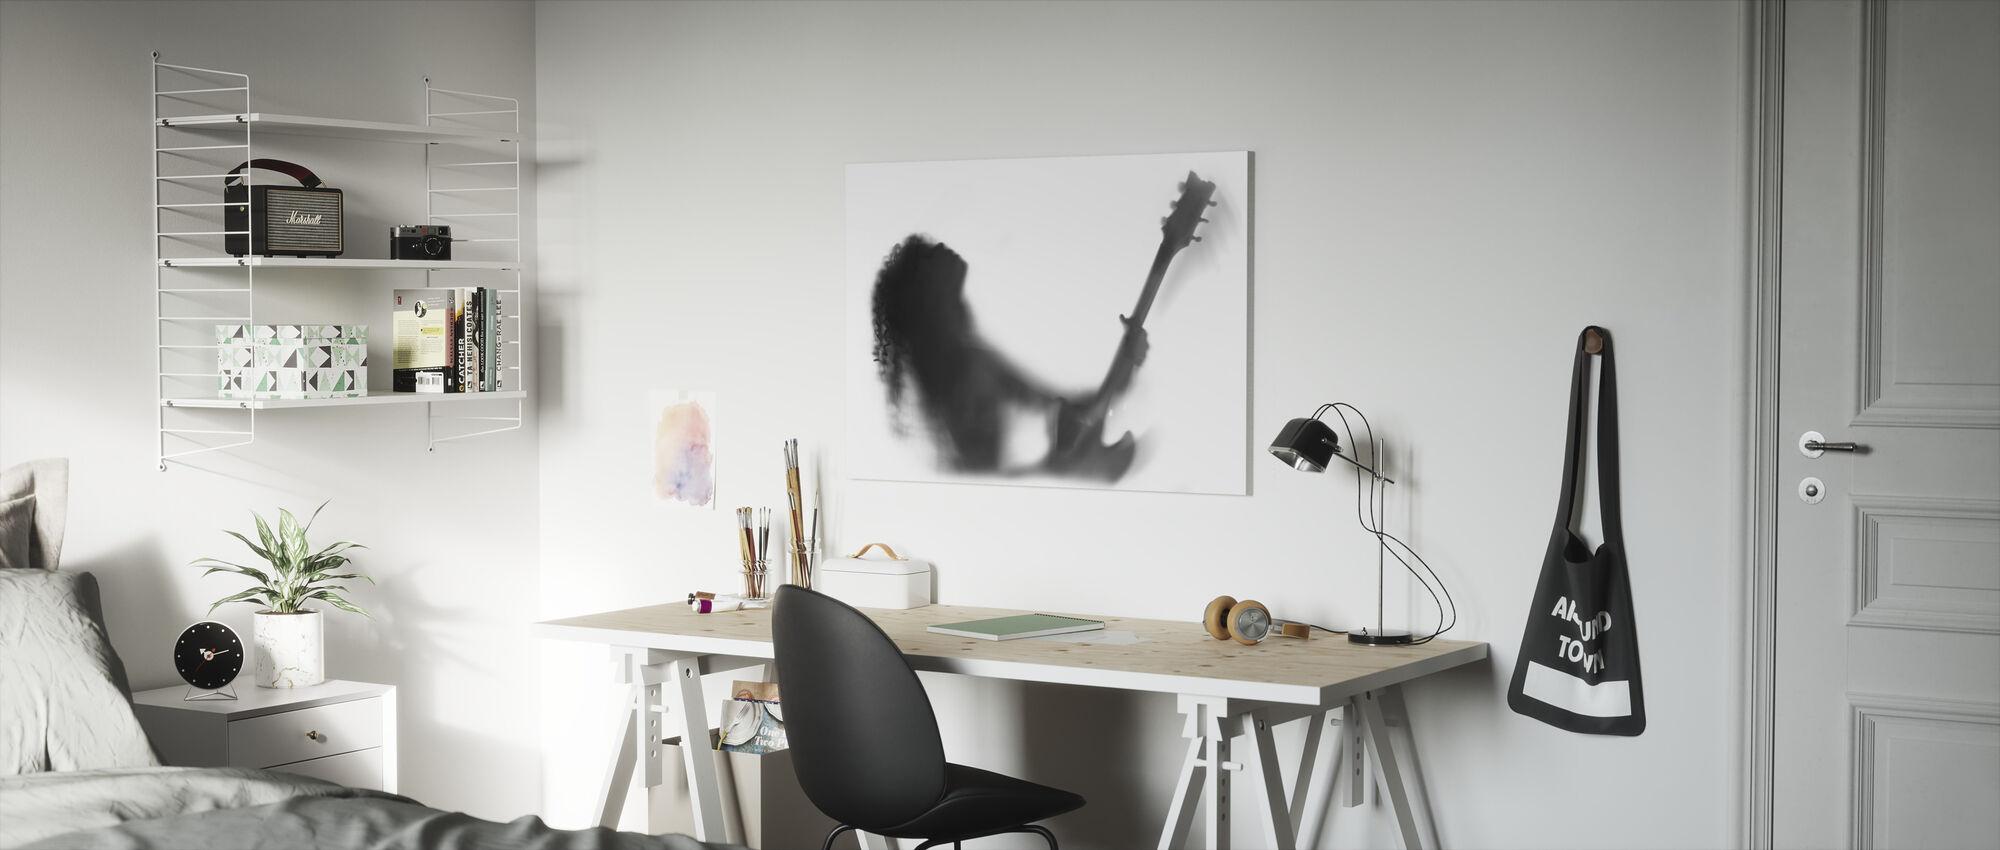 Gitaar Solo - Canvas print - Kinderkamer